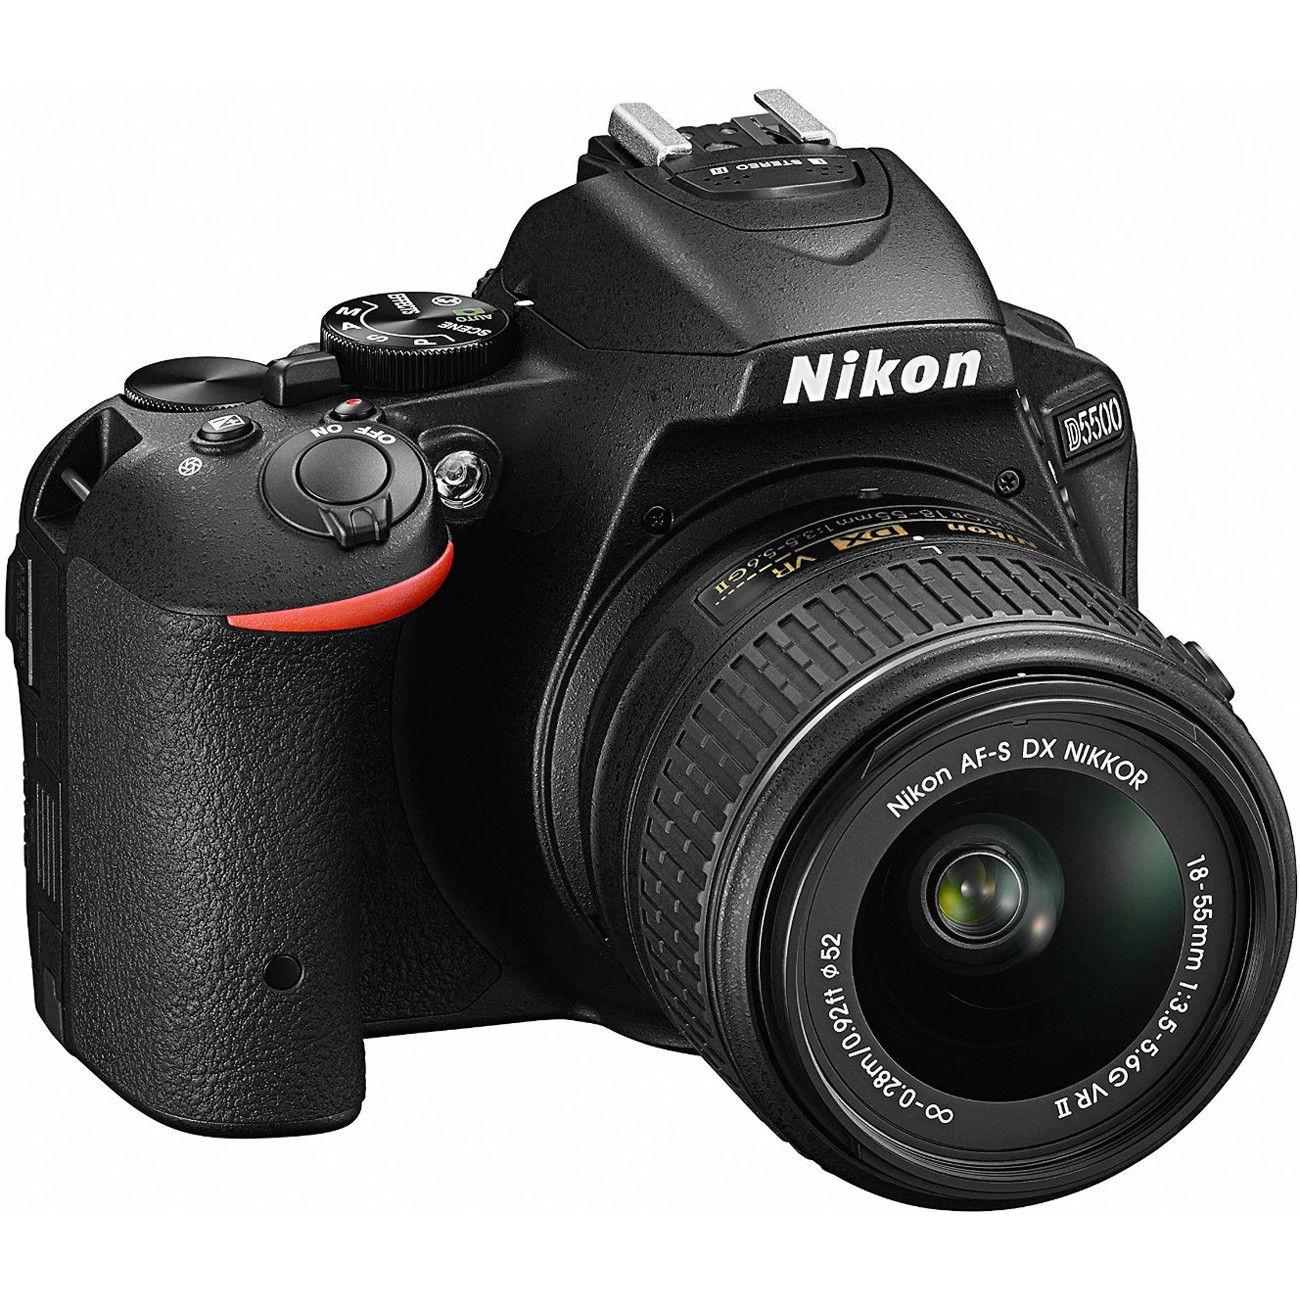 Nikon D5500 DX-format Digital SLR w/ 18-55mm VR II (Refurbished)  + Free shipping $449.99